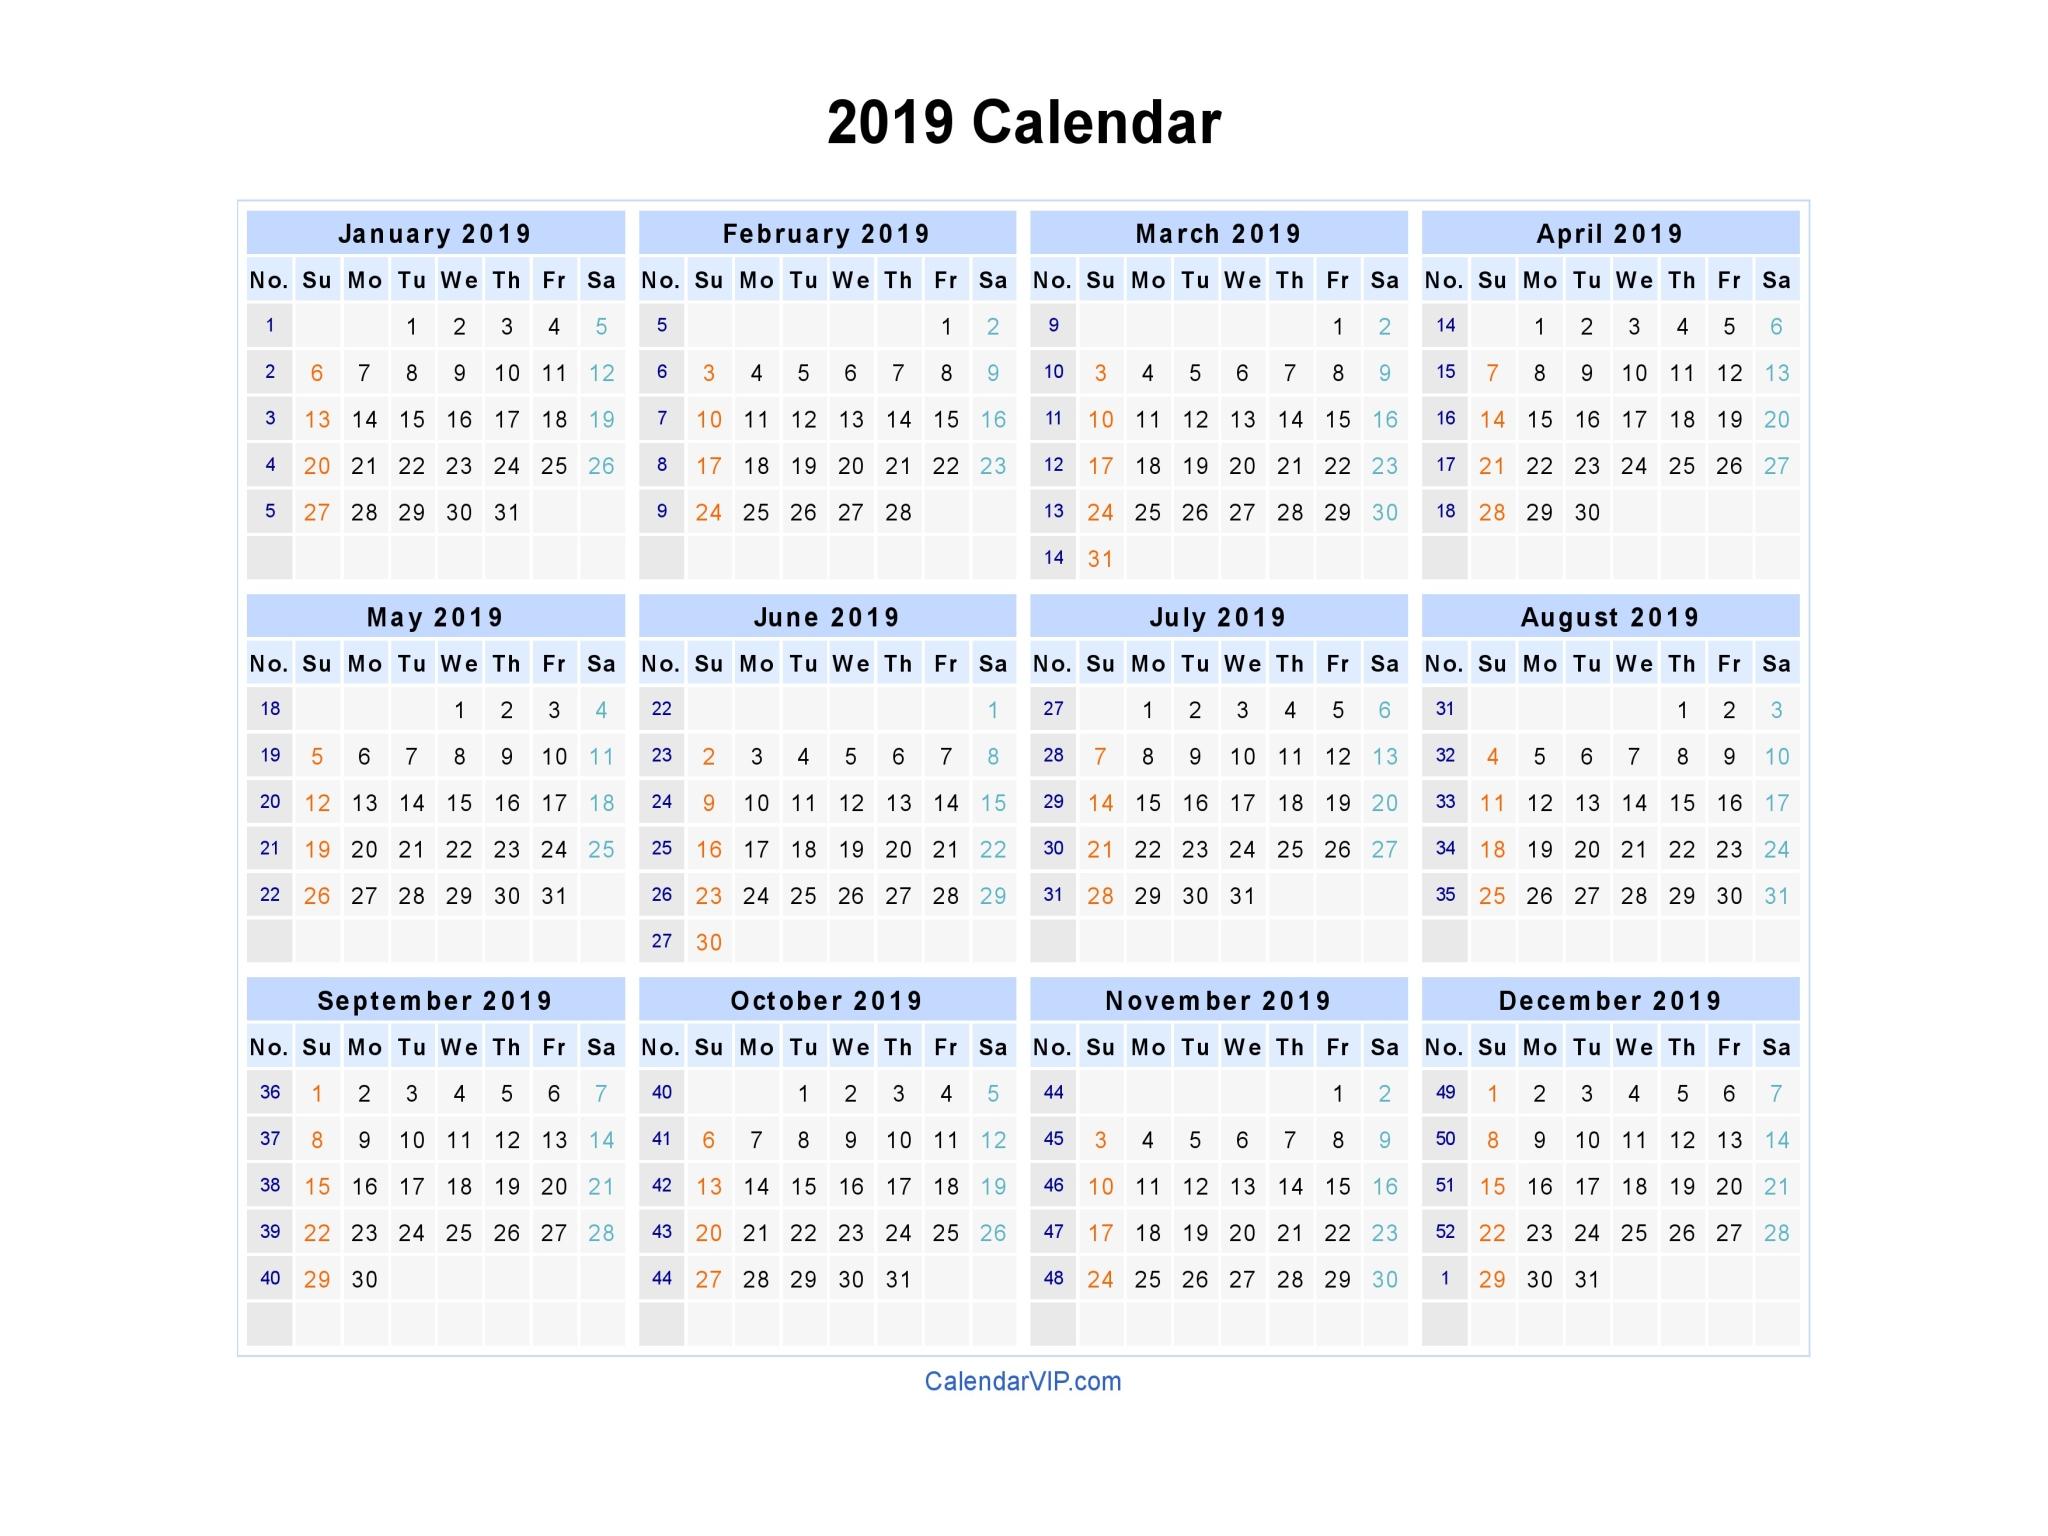 2019 Calendar - Blank Printable Calendar Template In Pdf Word Excel throughout A3 Calendar Template Printable